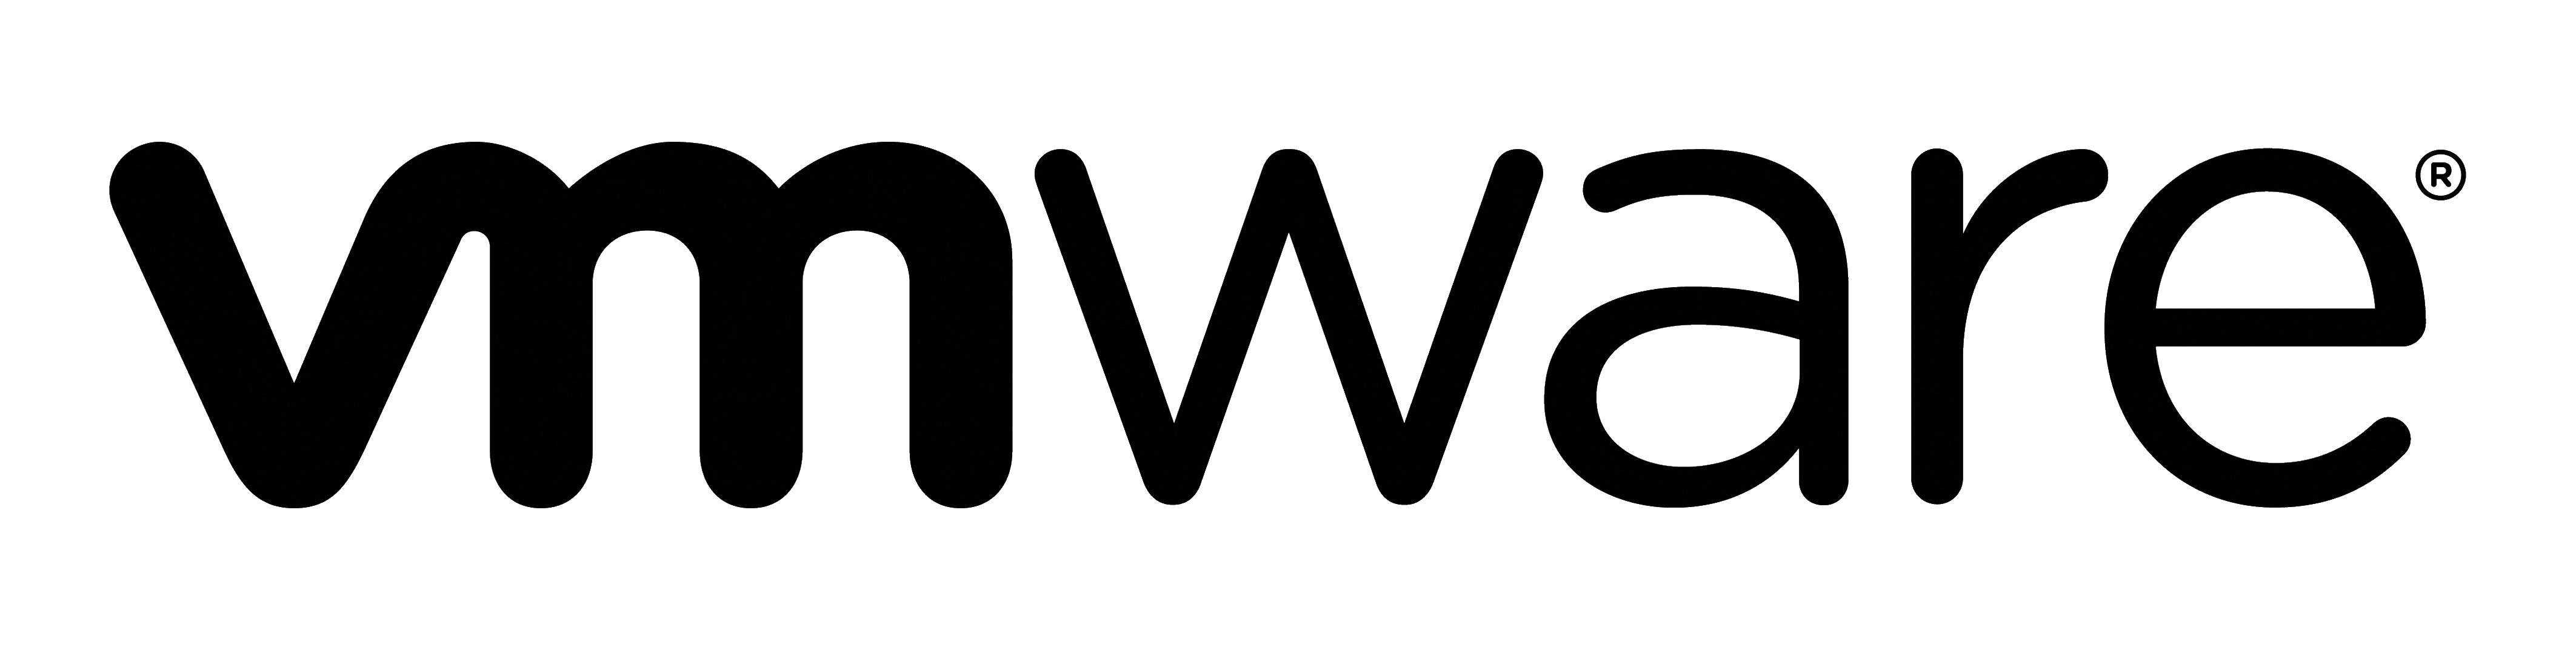 Carahsoft :: Vmware - Vmware Logo PNG